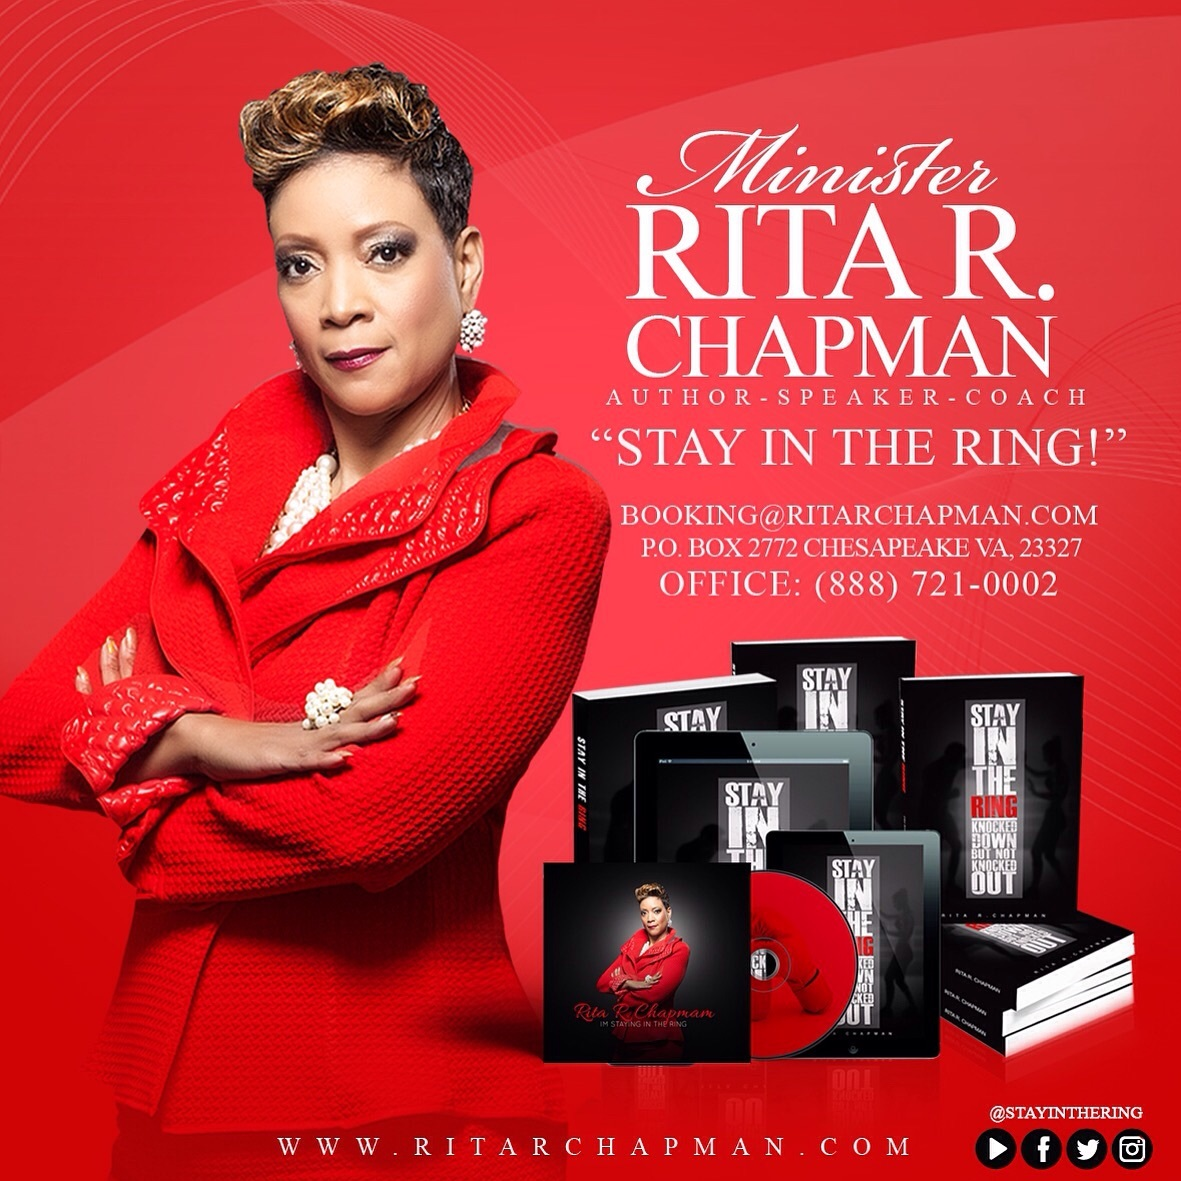 Minister Rita R. Chapman